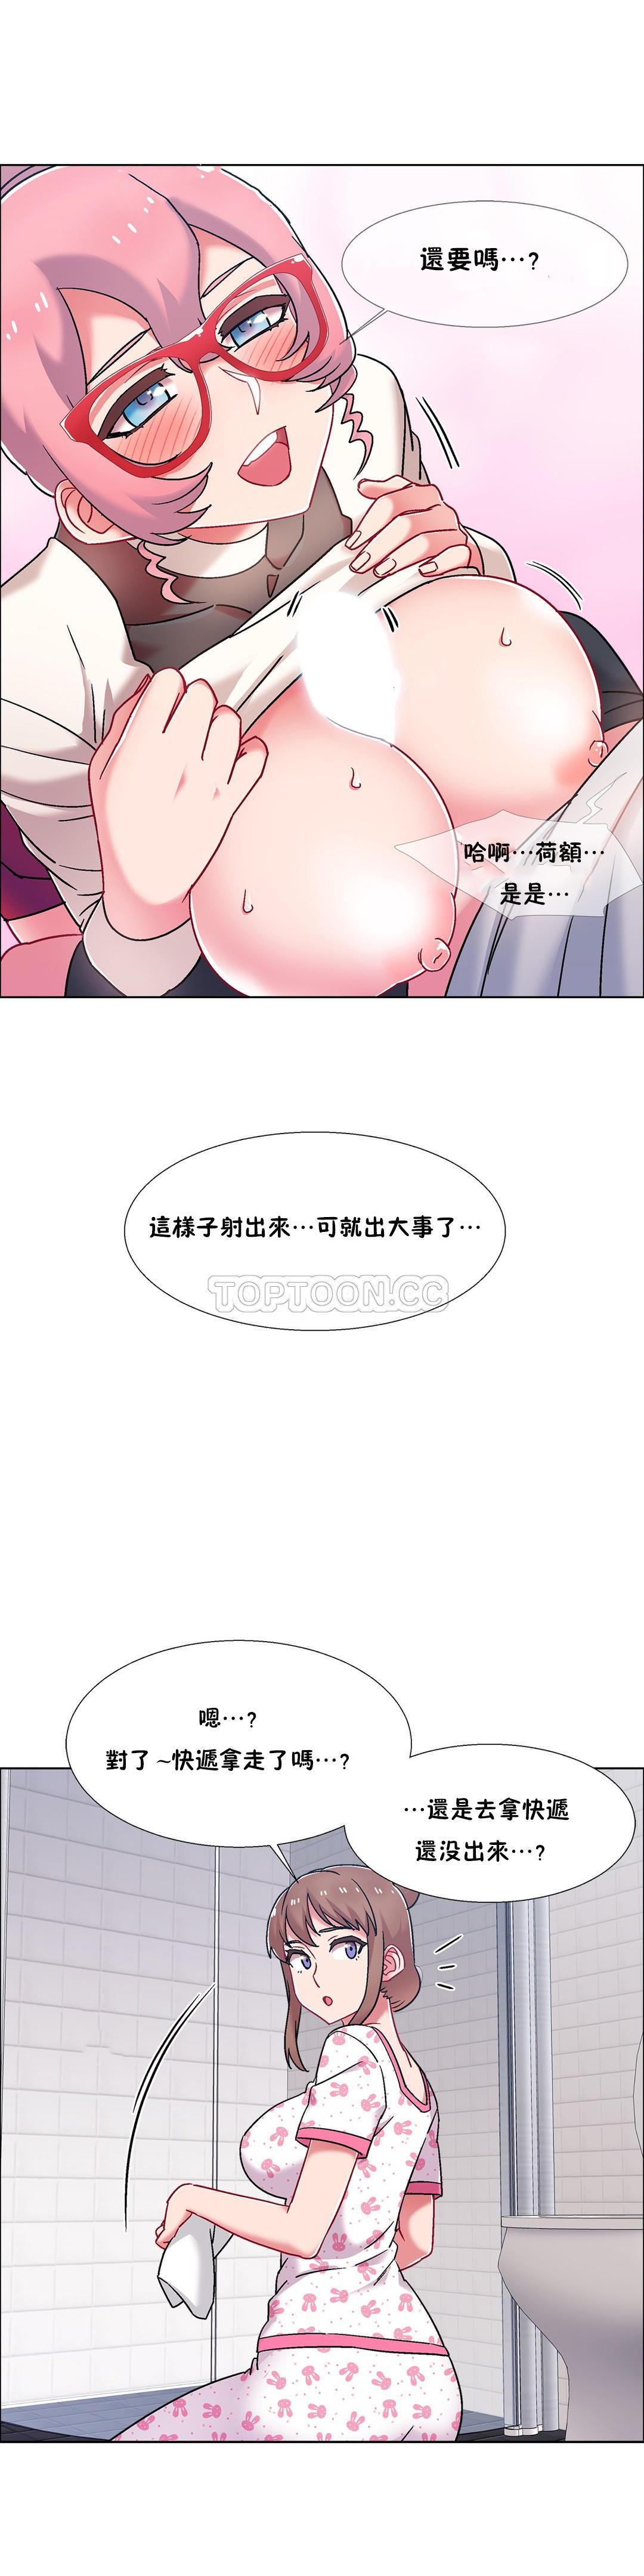 [Studio Wannabe] Rental Girls | 出租女郎 Ch. 33-58 [Chinese]  第二季 完结 489